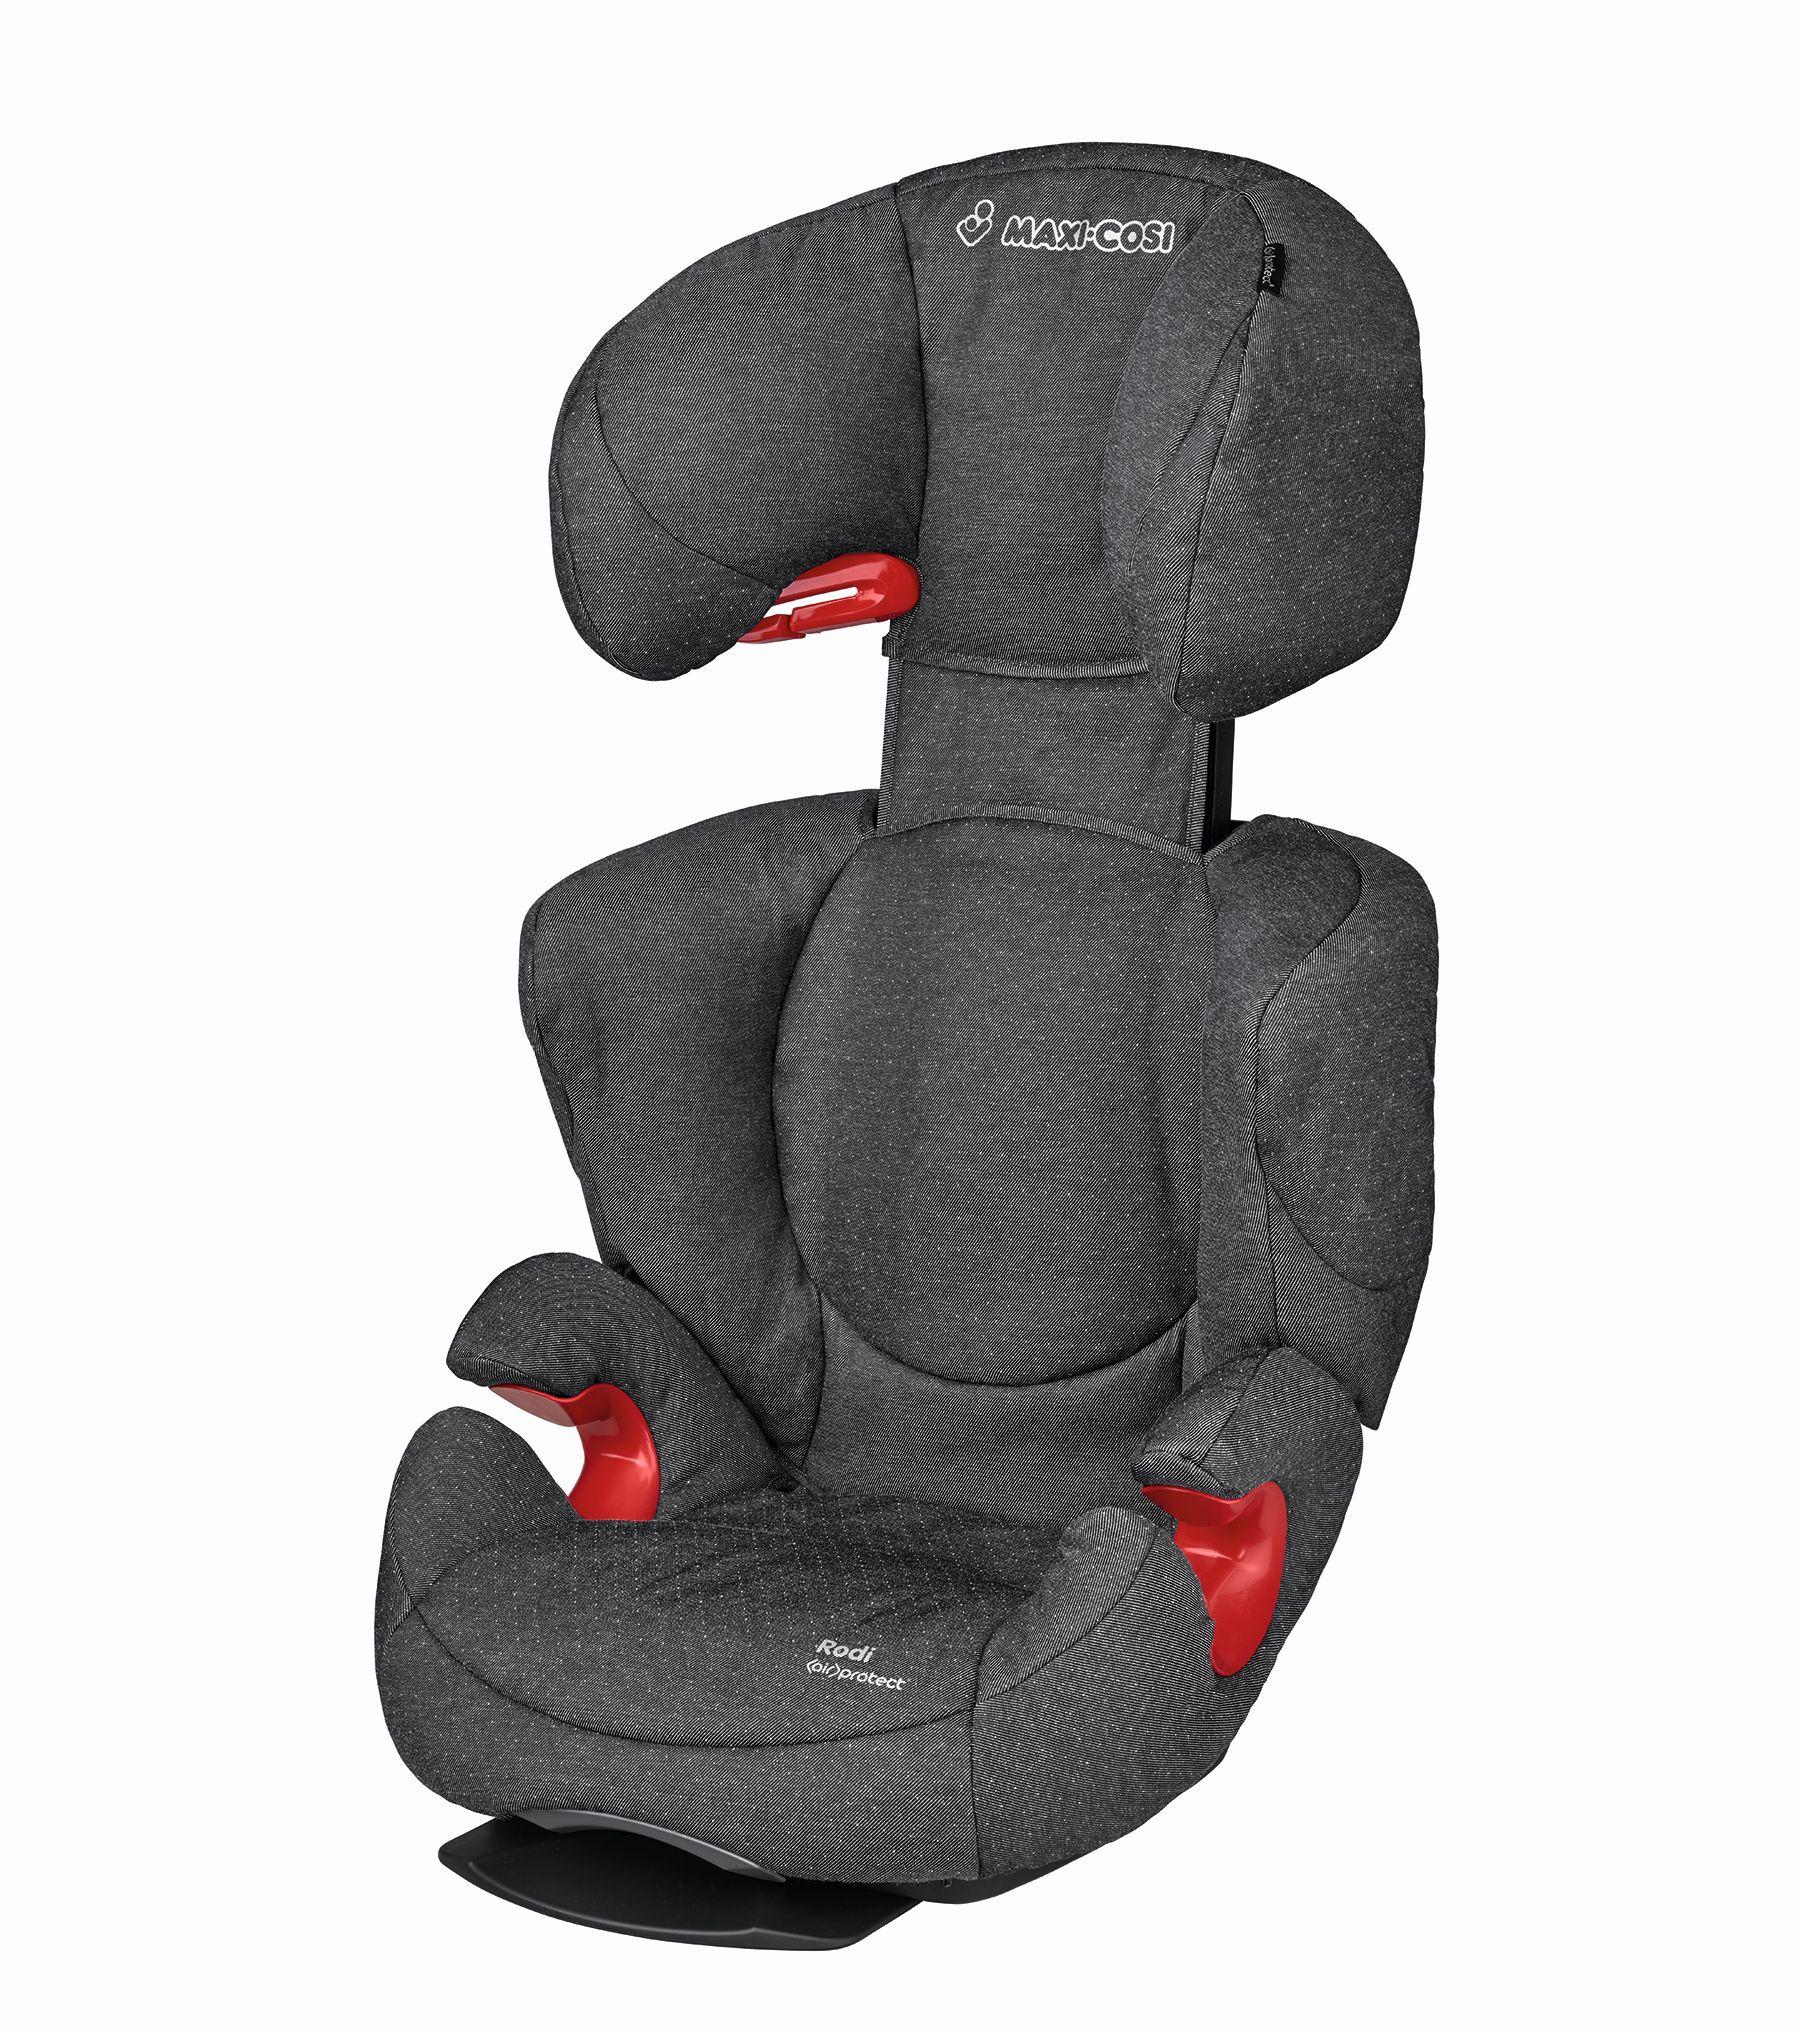 maxi cosi silla de coche rodi air protect 2018 sparkling grey comprar en kidsroom sillas de. Black Bedroom Furniture Sets. Home Design Ideas